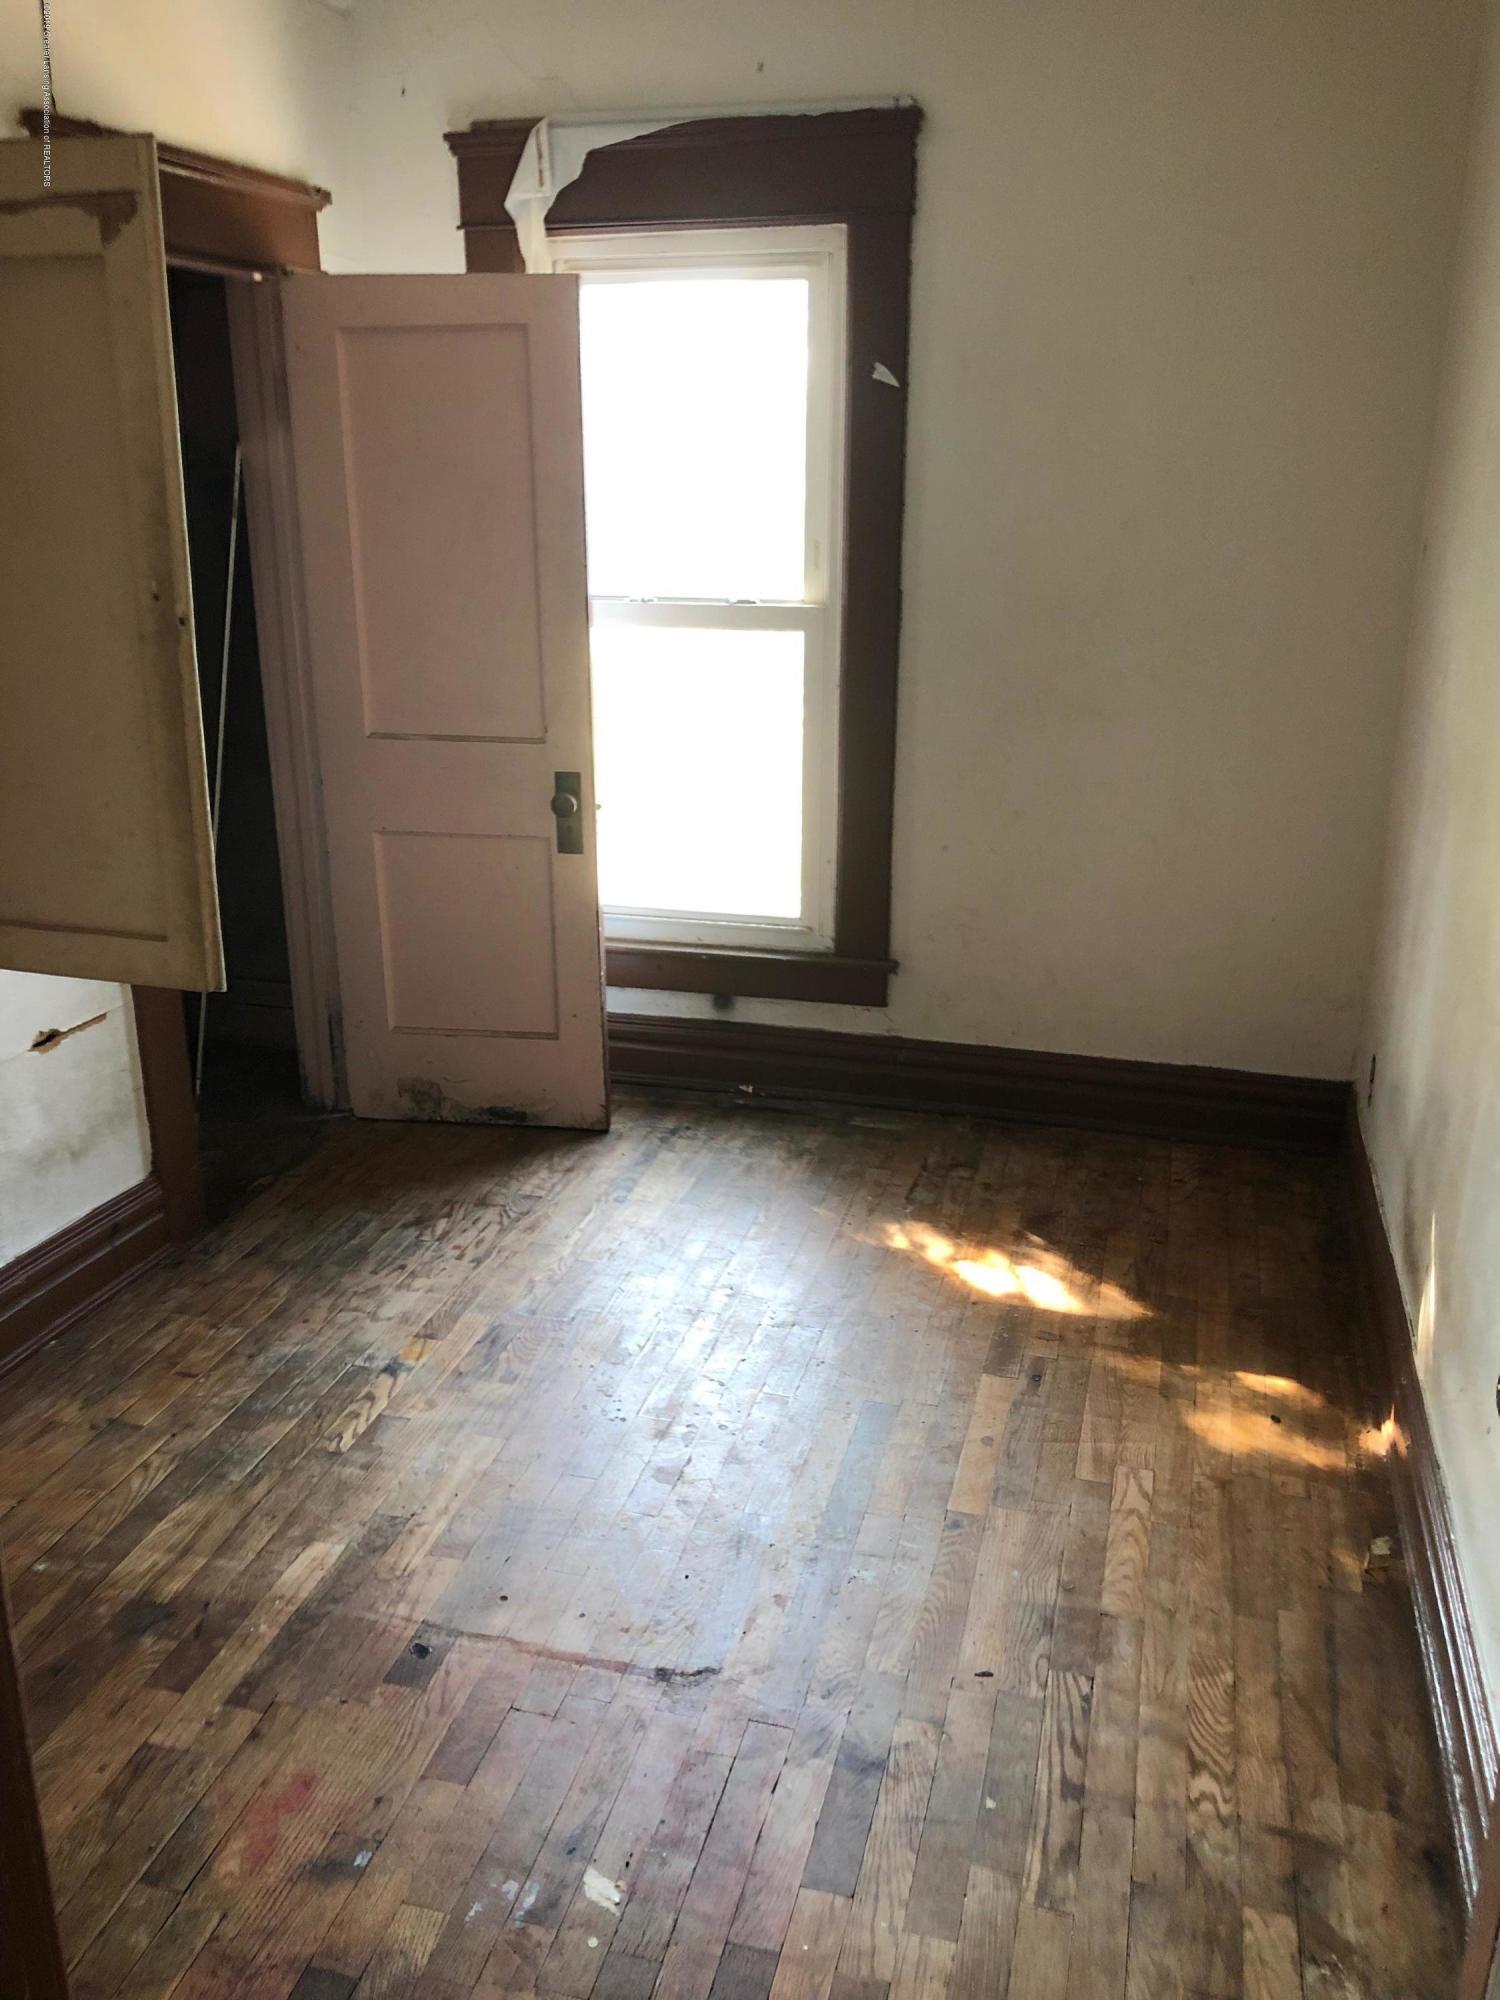 726 W Willow St - Bedroom - 5